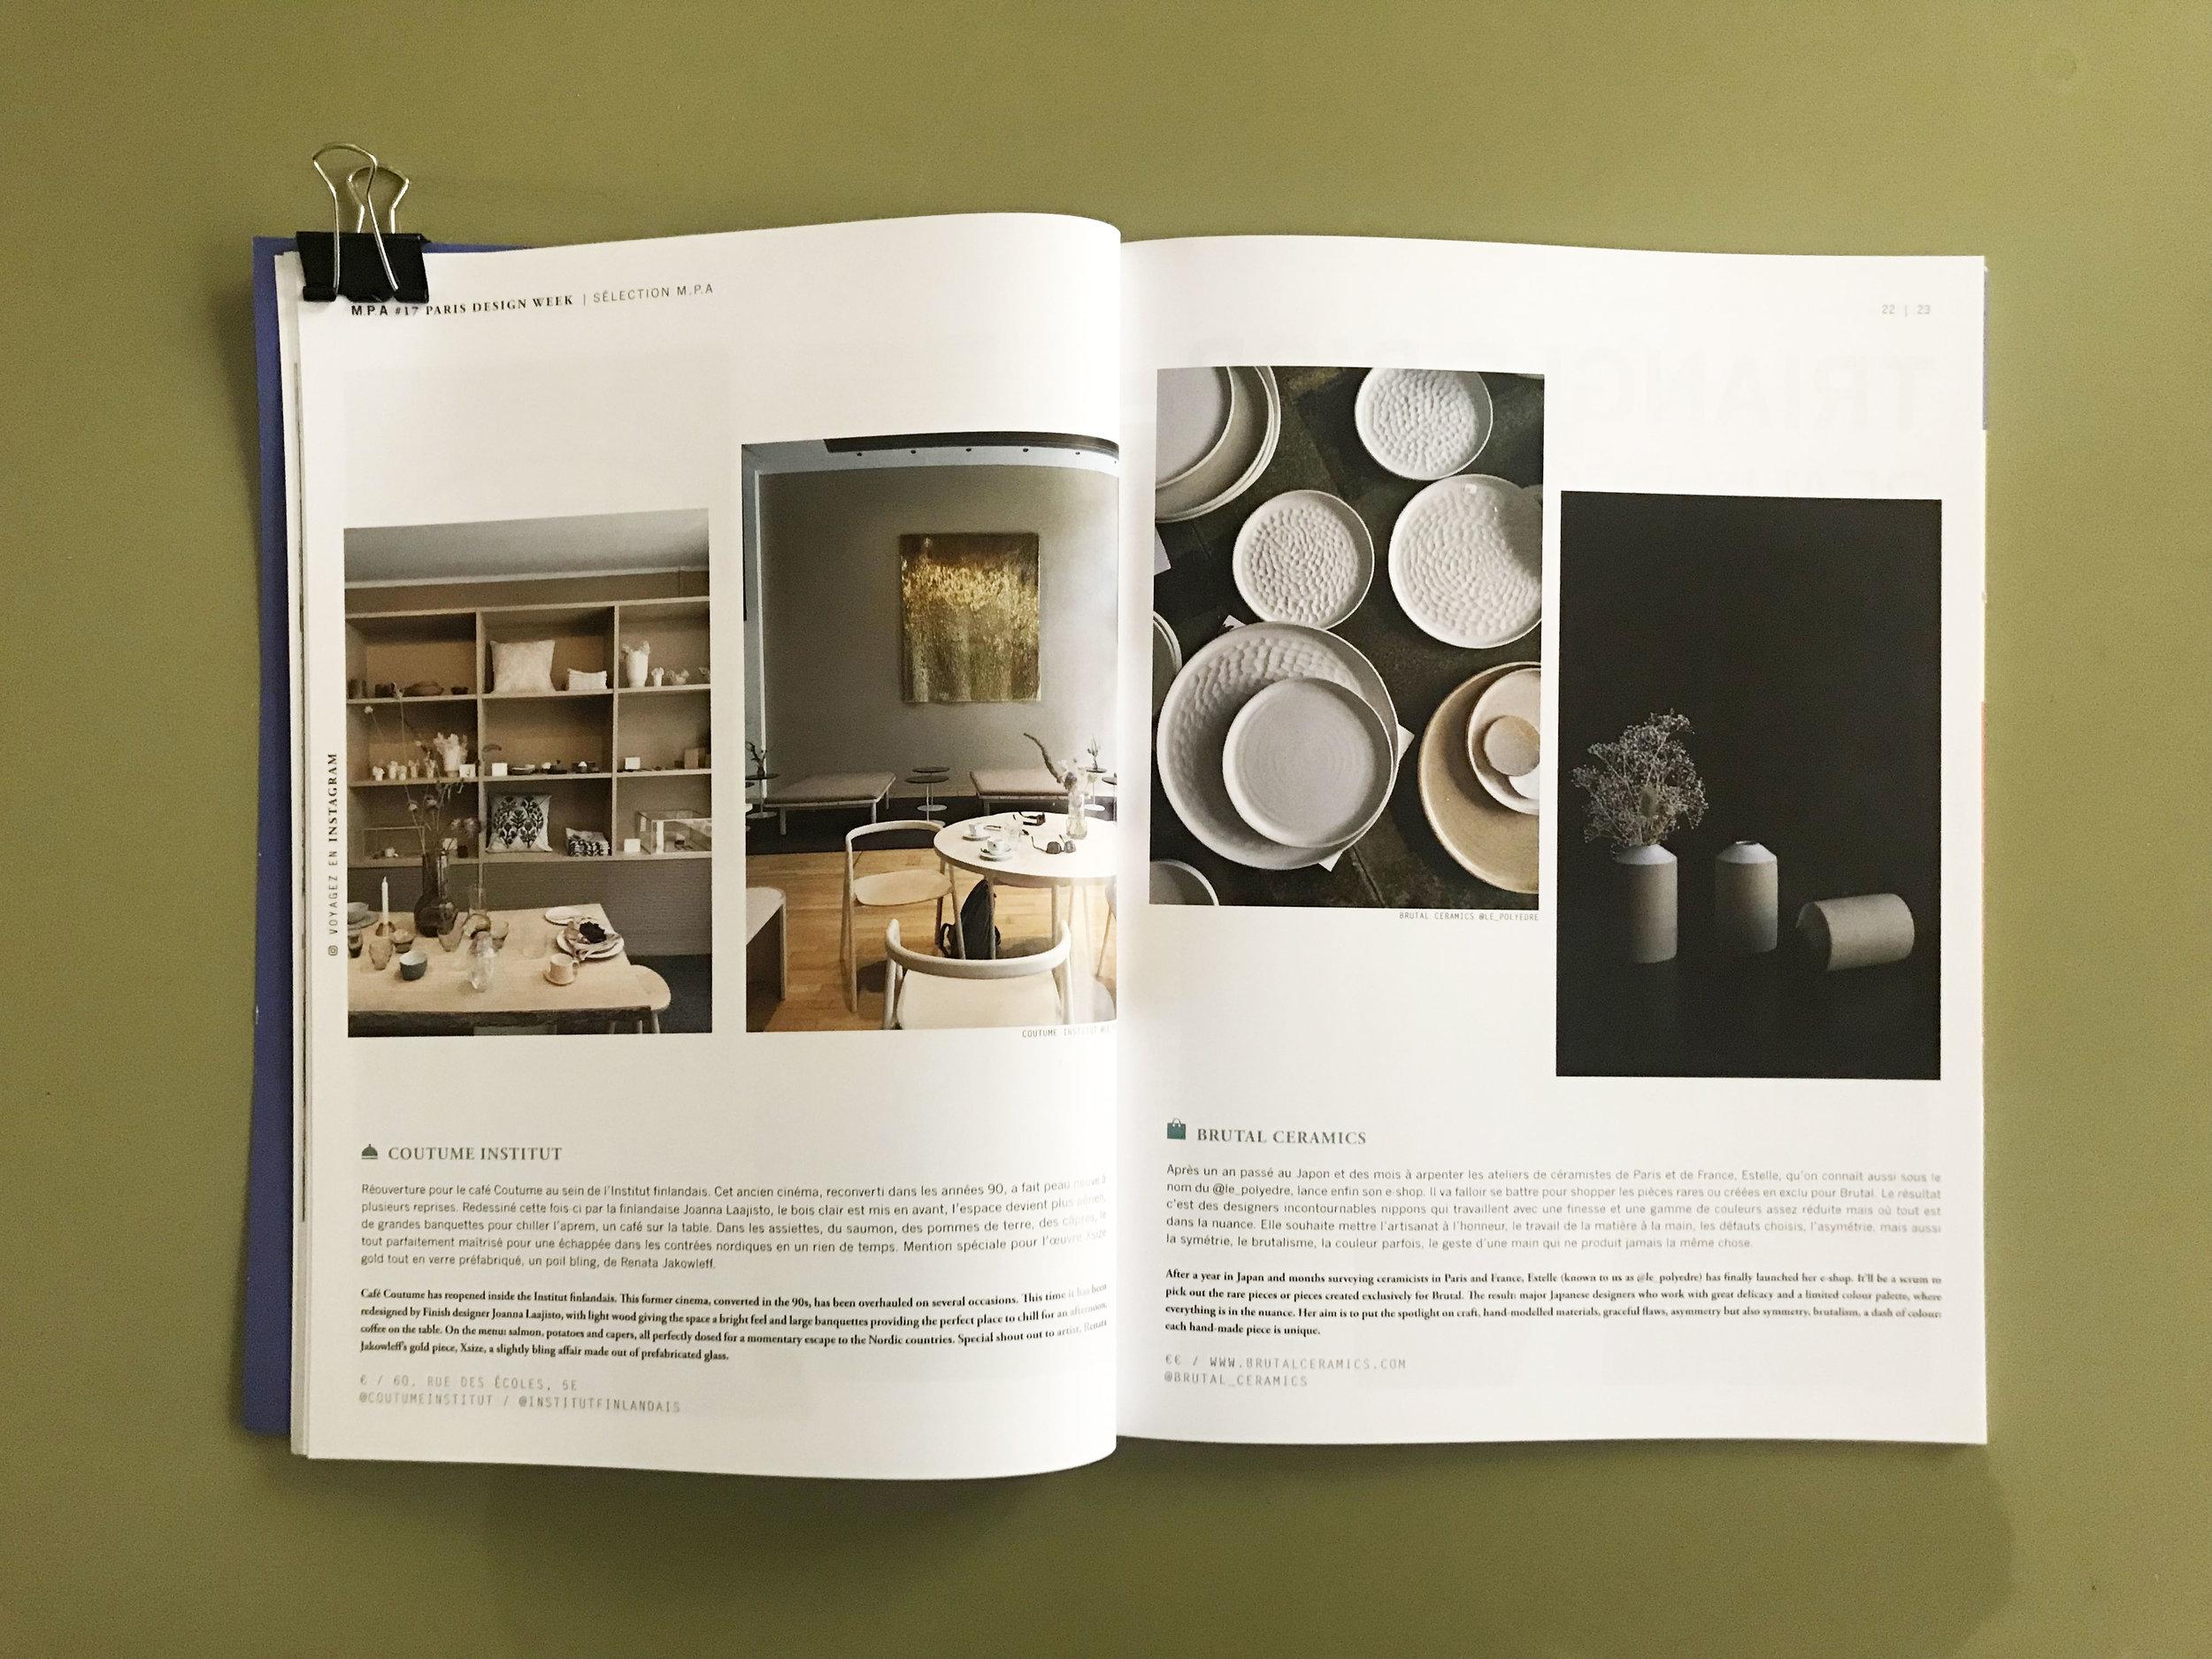 Interior_design_paris_week_merci_pour_l_adresse_5.jpg